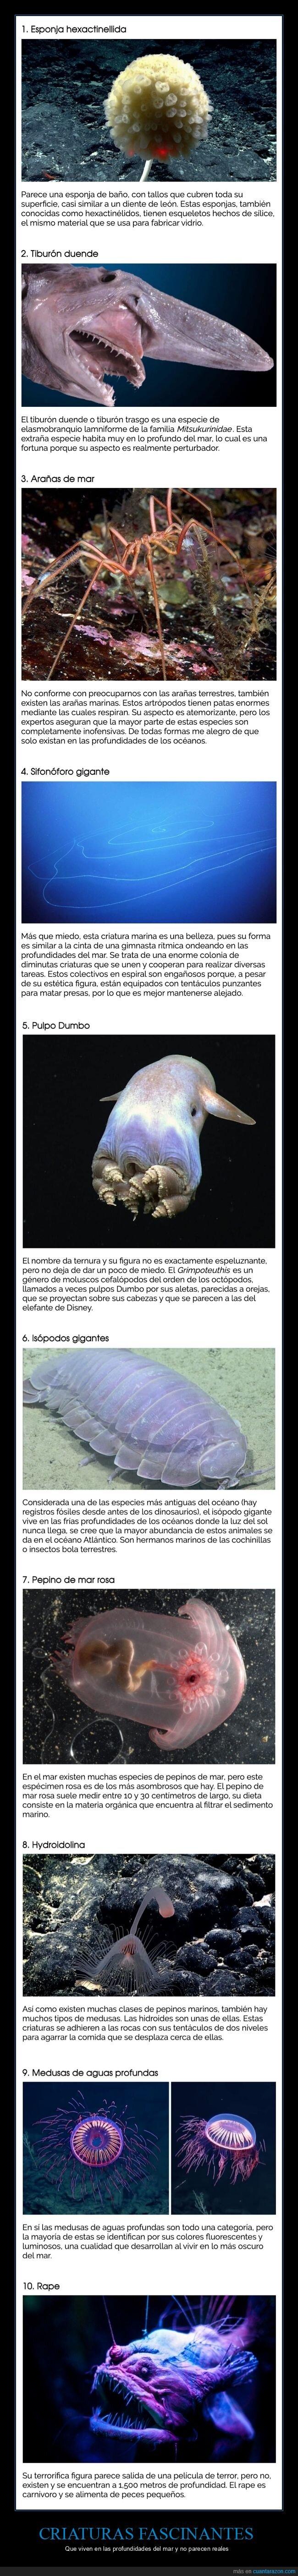 criaturas,mar,profundidades